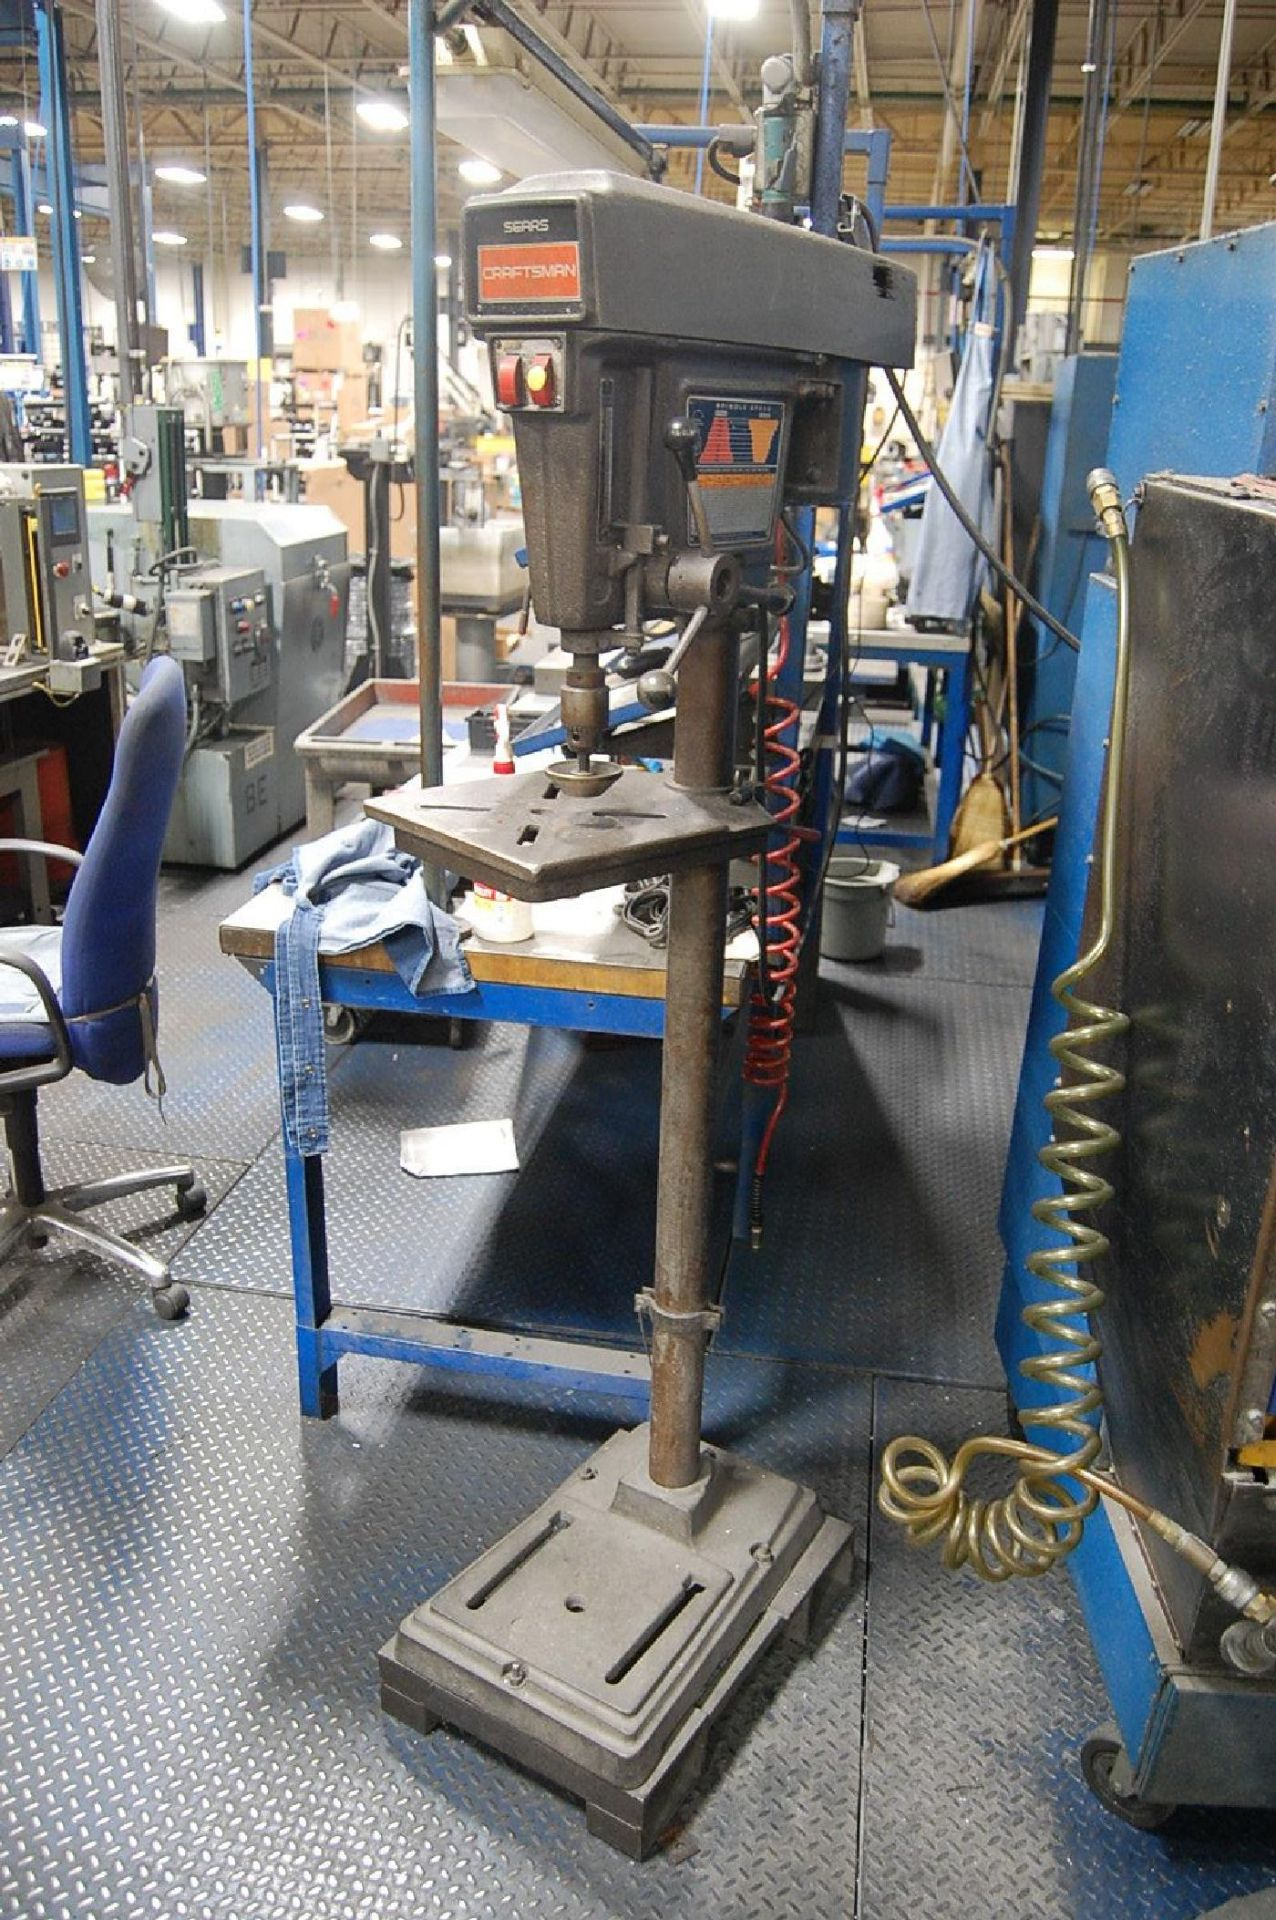 Lot 5 - Sears Craftsman Pedestal Type Drill Press